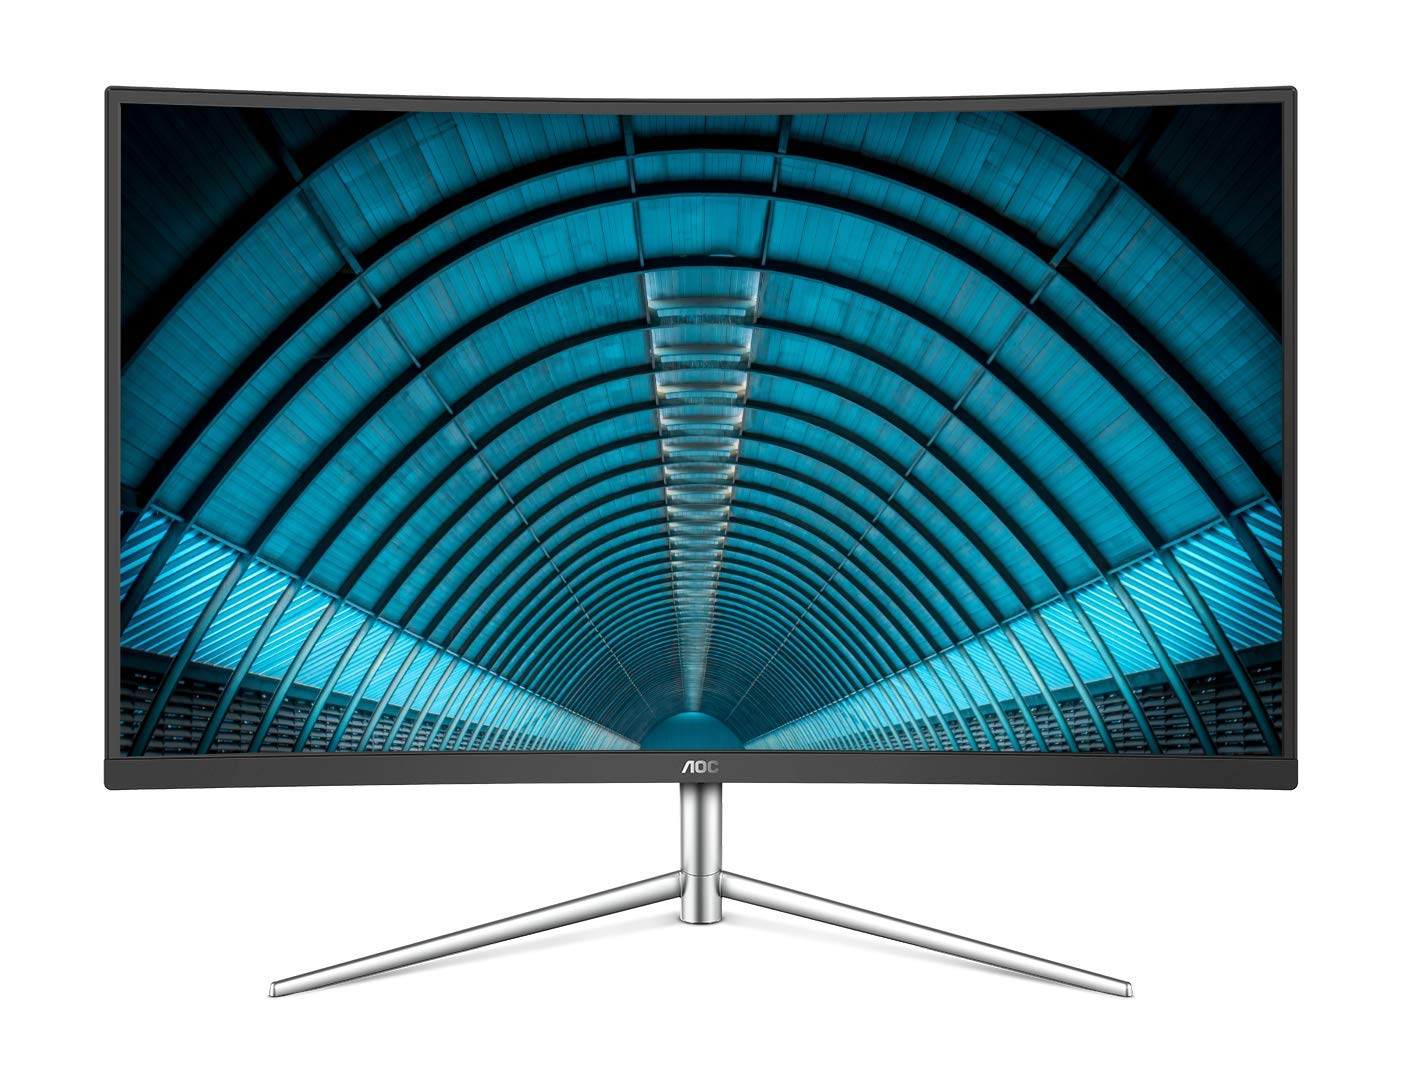 AOC C32V1Q 31.5'' Full HD 1920x1080 Monitor, Curved VA Panel, 4ms 75hz, Frameless, HDMI/DisplayPort/VGA, FlickerFree, Low Blue Mode, VESA